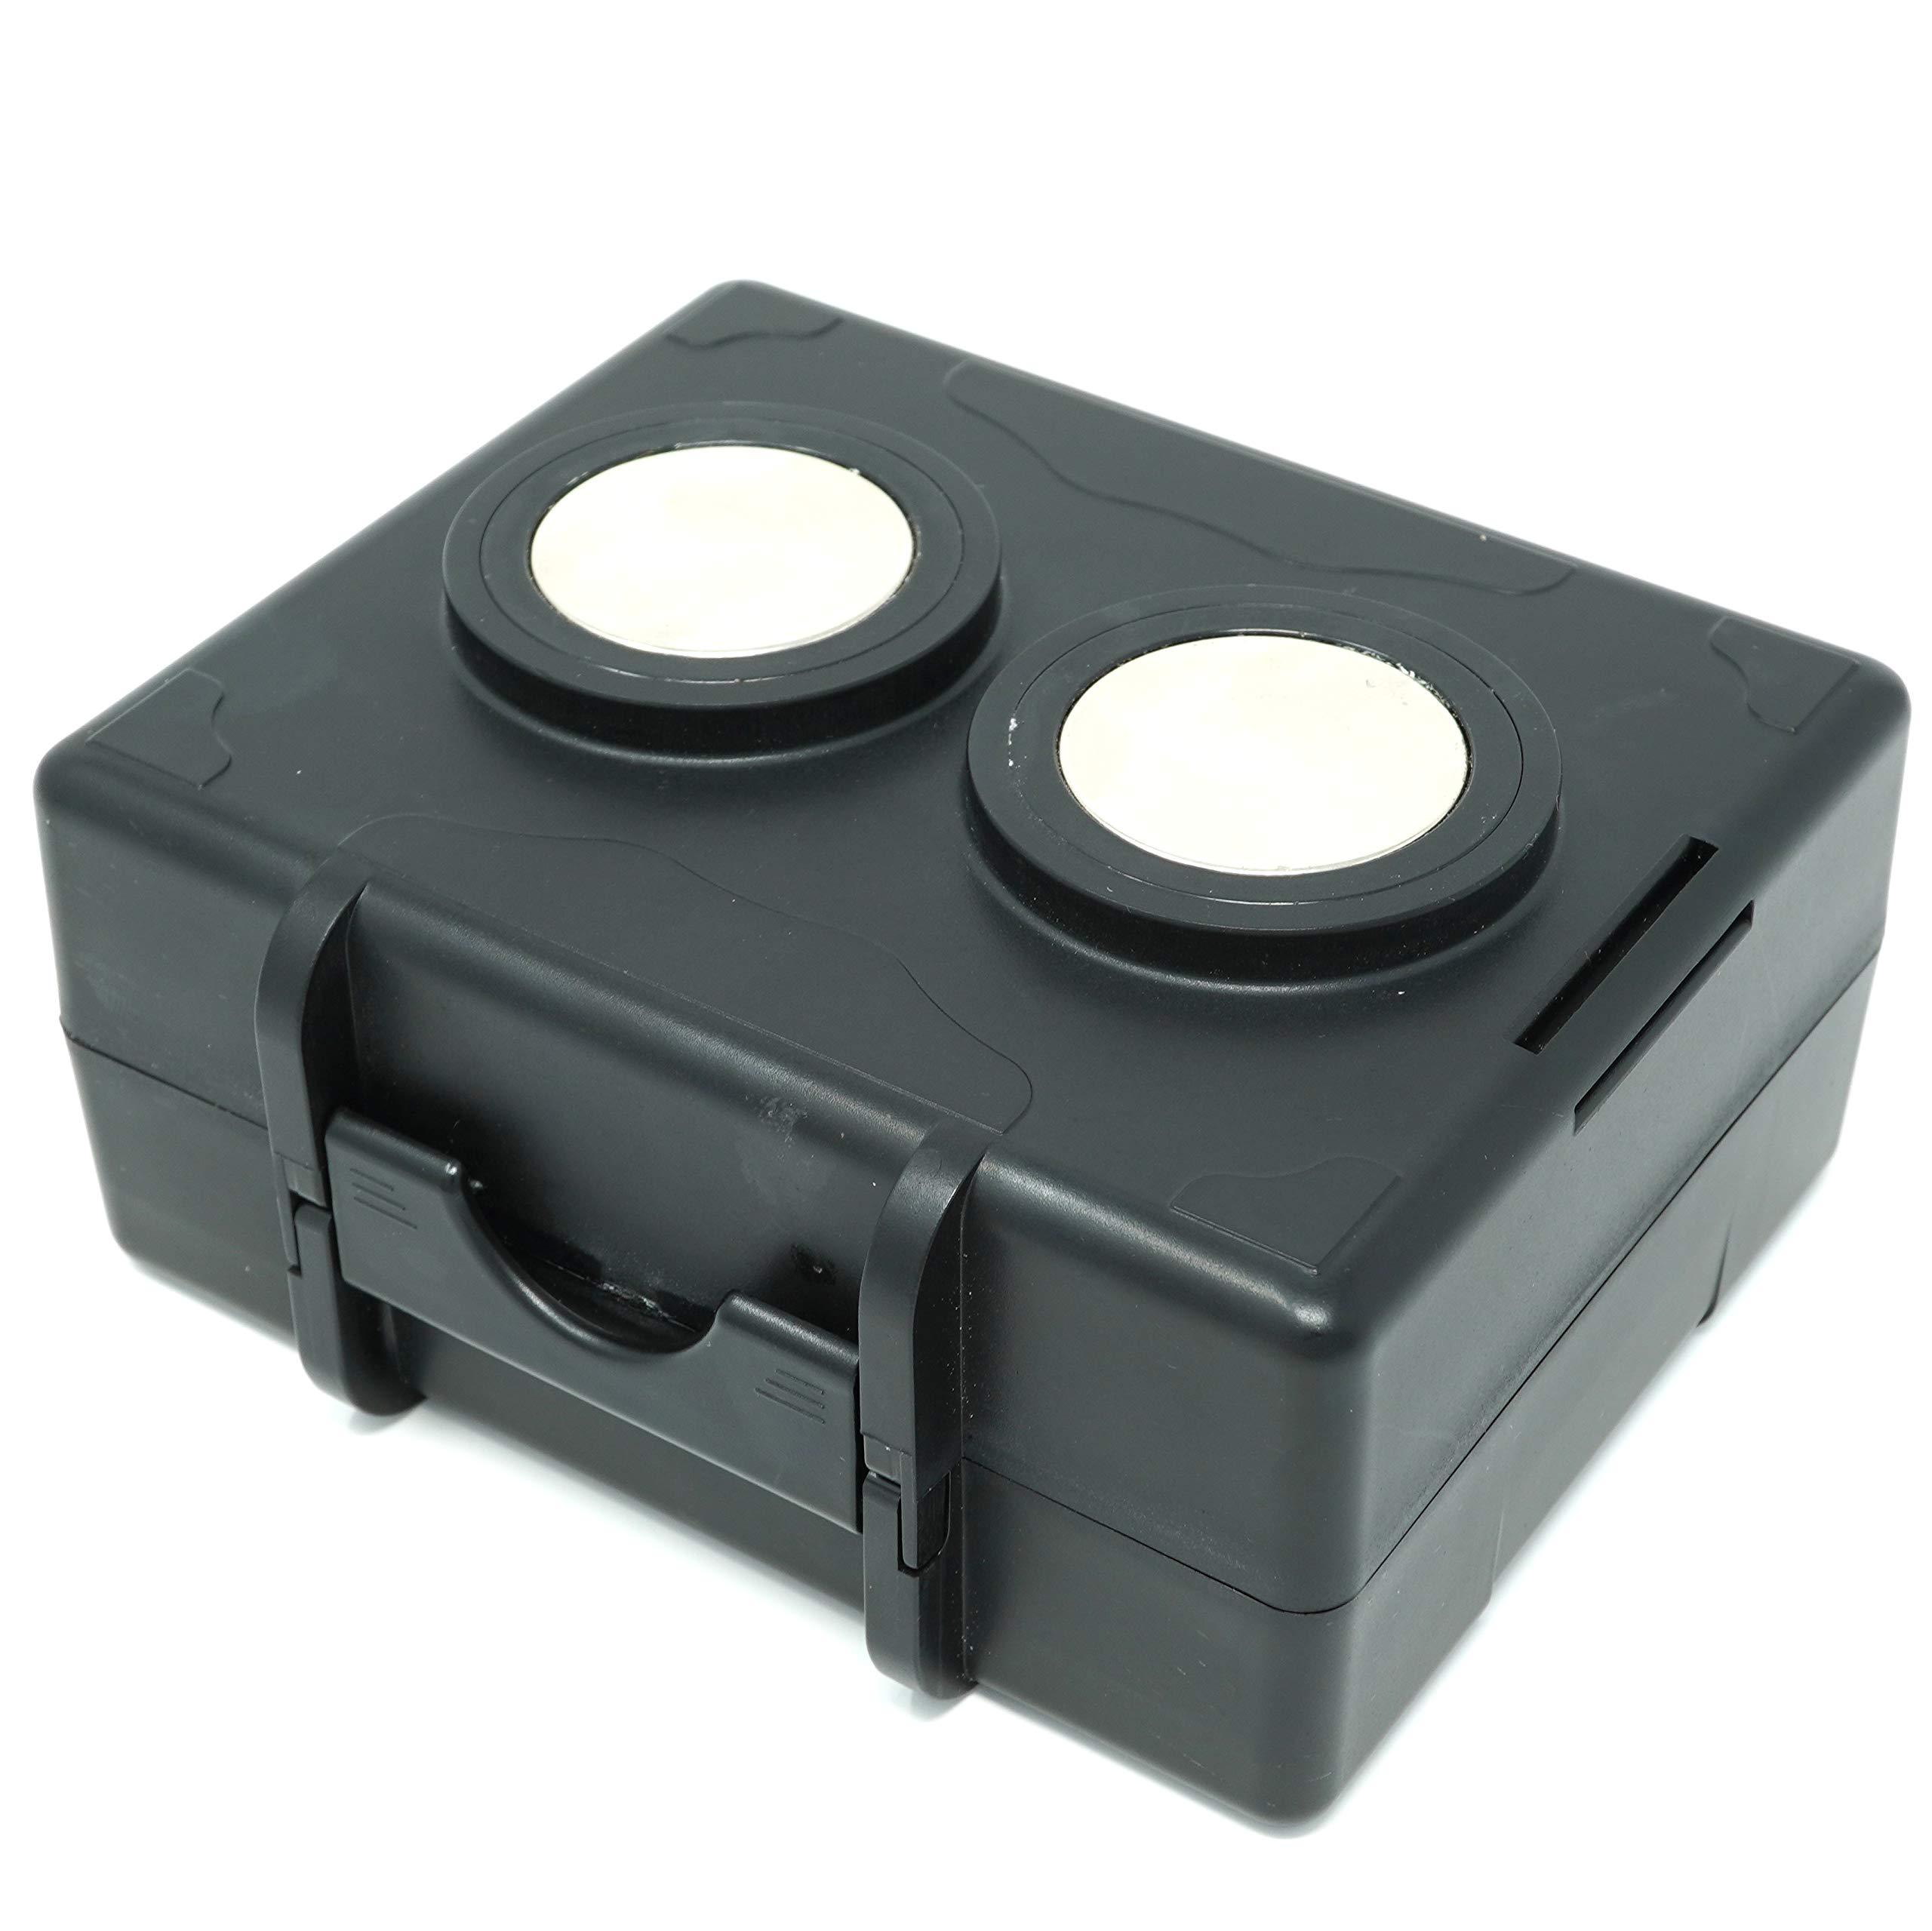 Extended Battery Pack Magnet Case for Optimus 2.0 GPS Tracker by Optimus Tracker